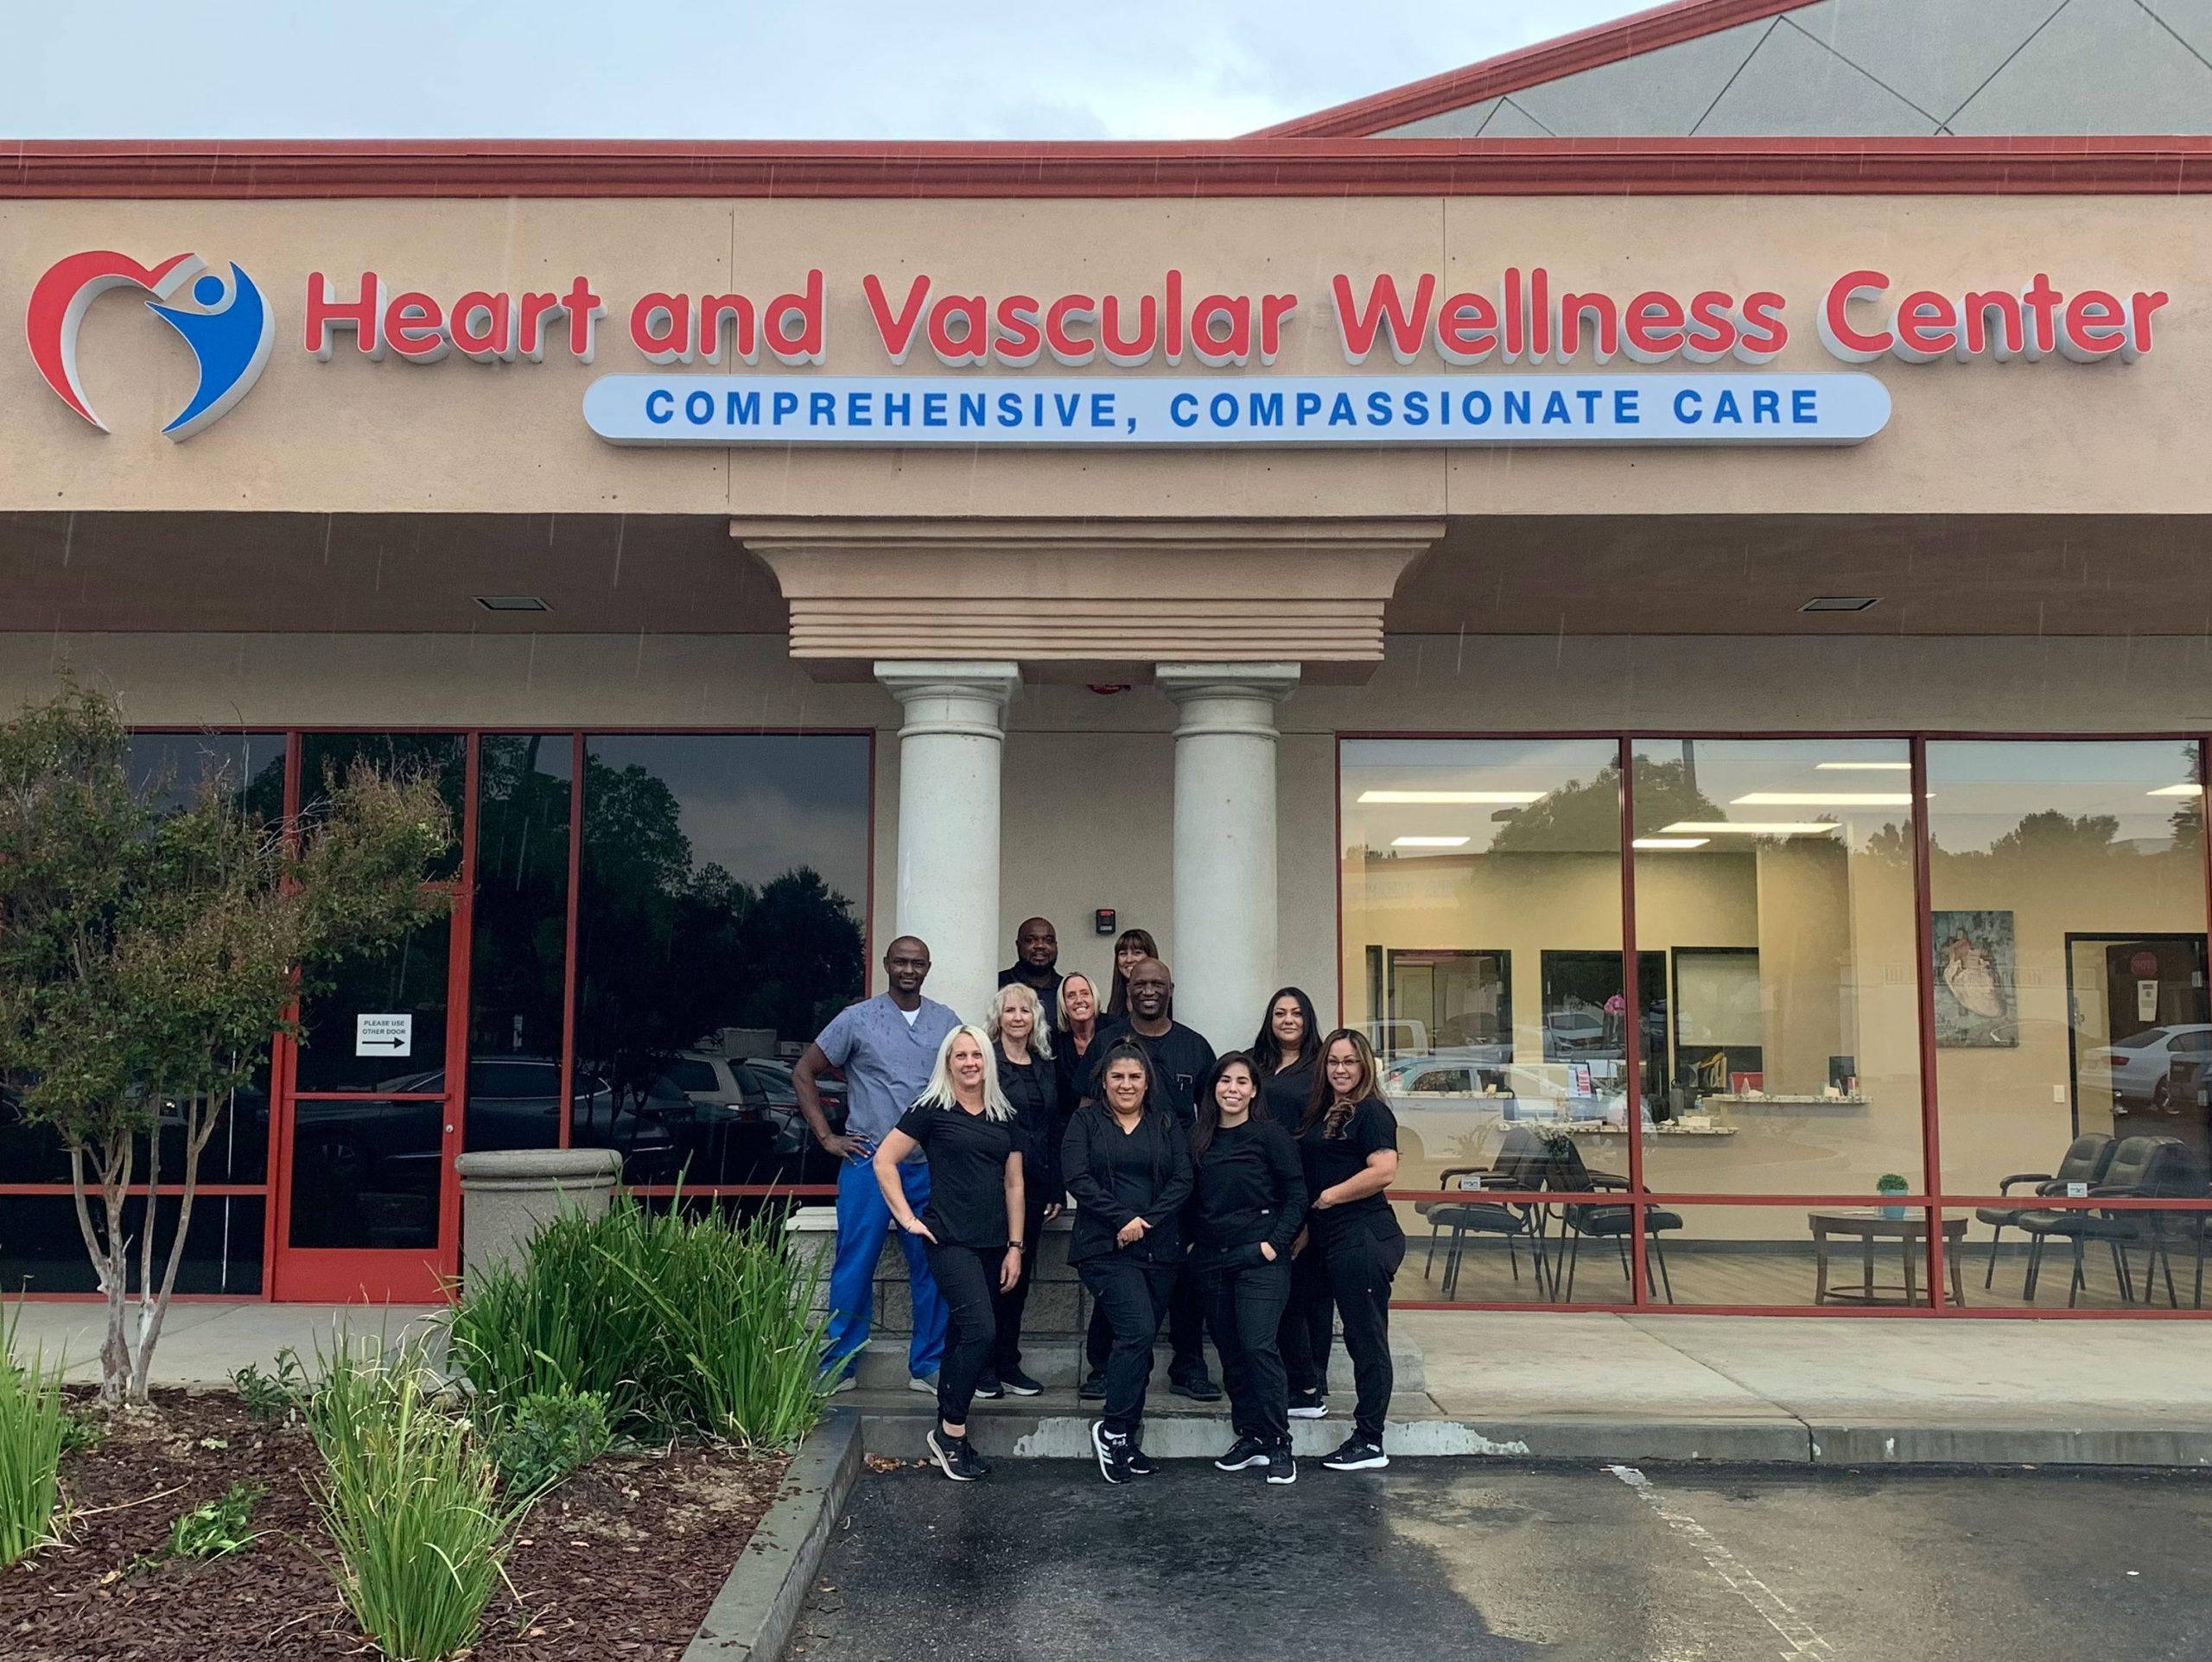 Heart and Vascular Wellness Center